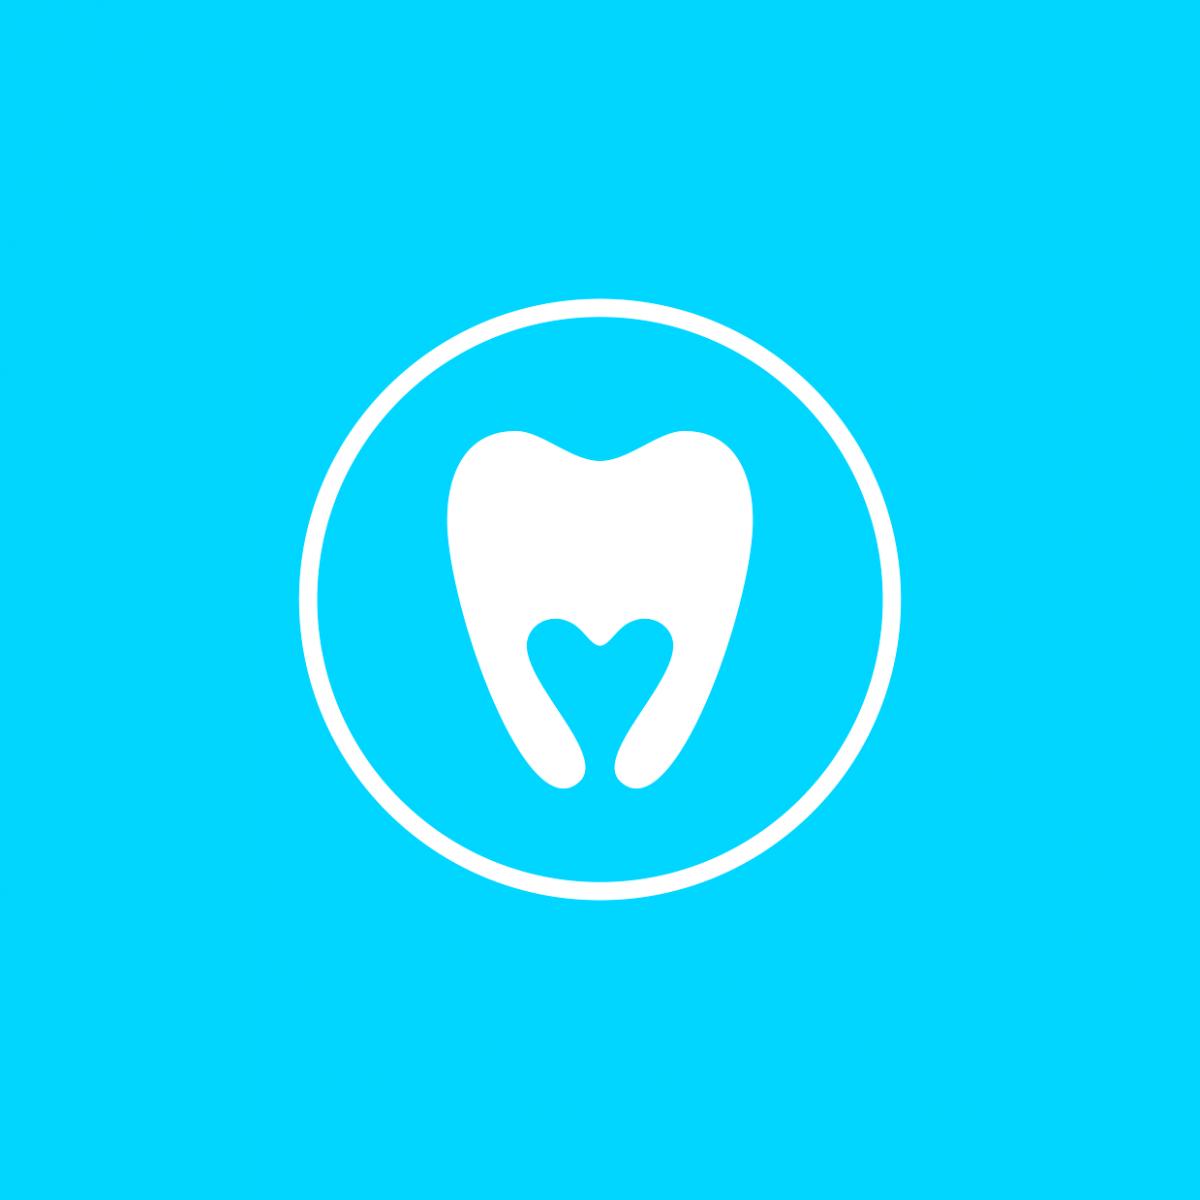 tandartspraktijk-diemen-zuid-logo-anneke-bouma-grafisch-ontwerp